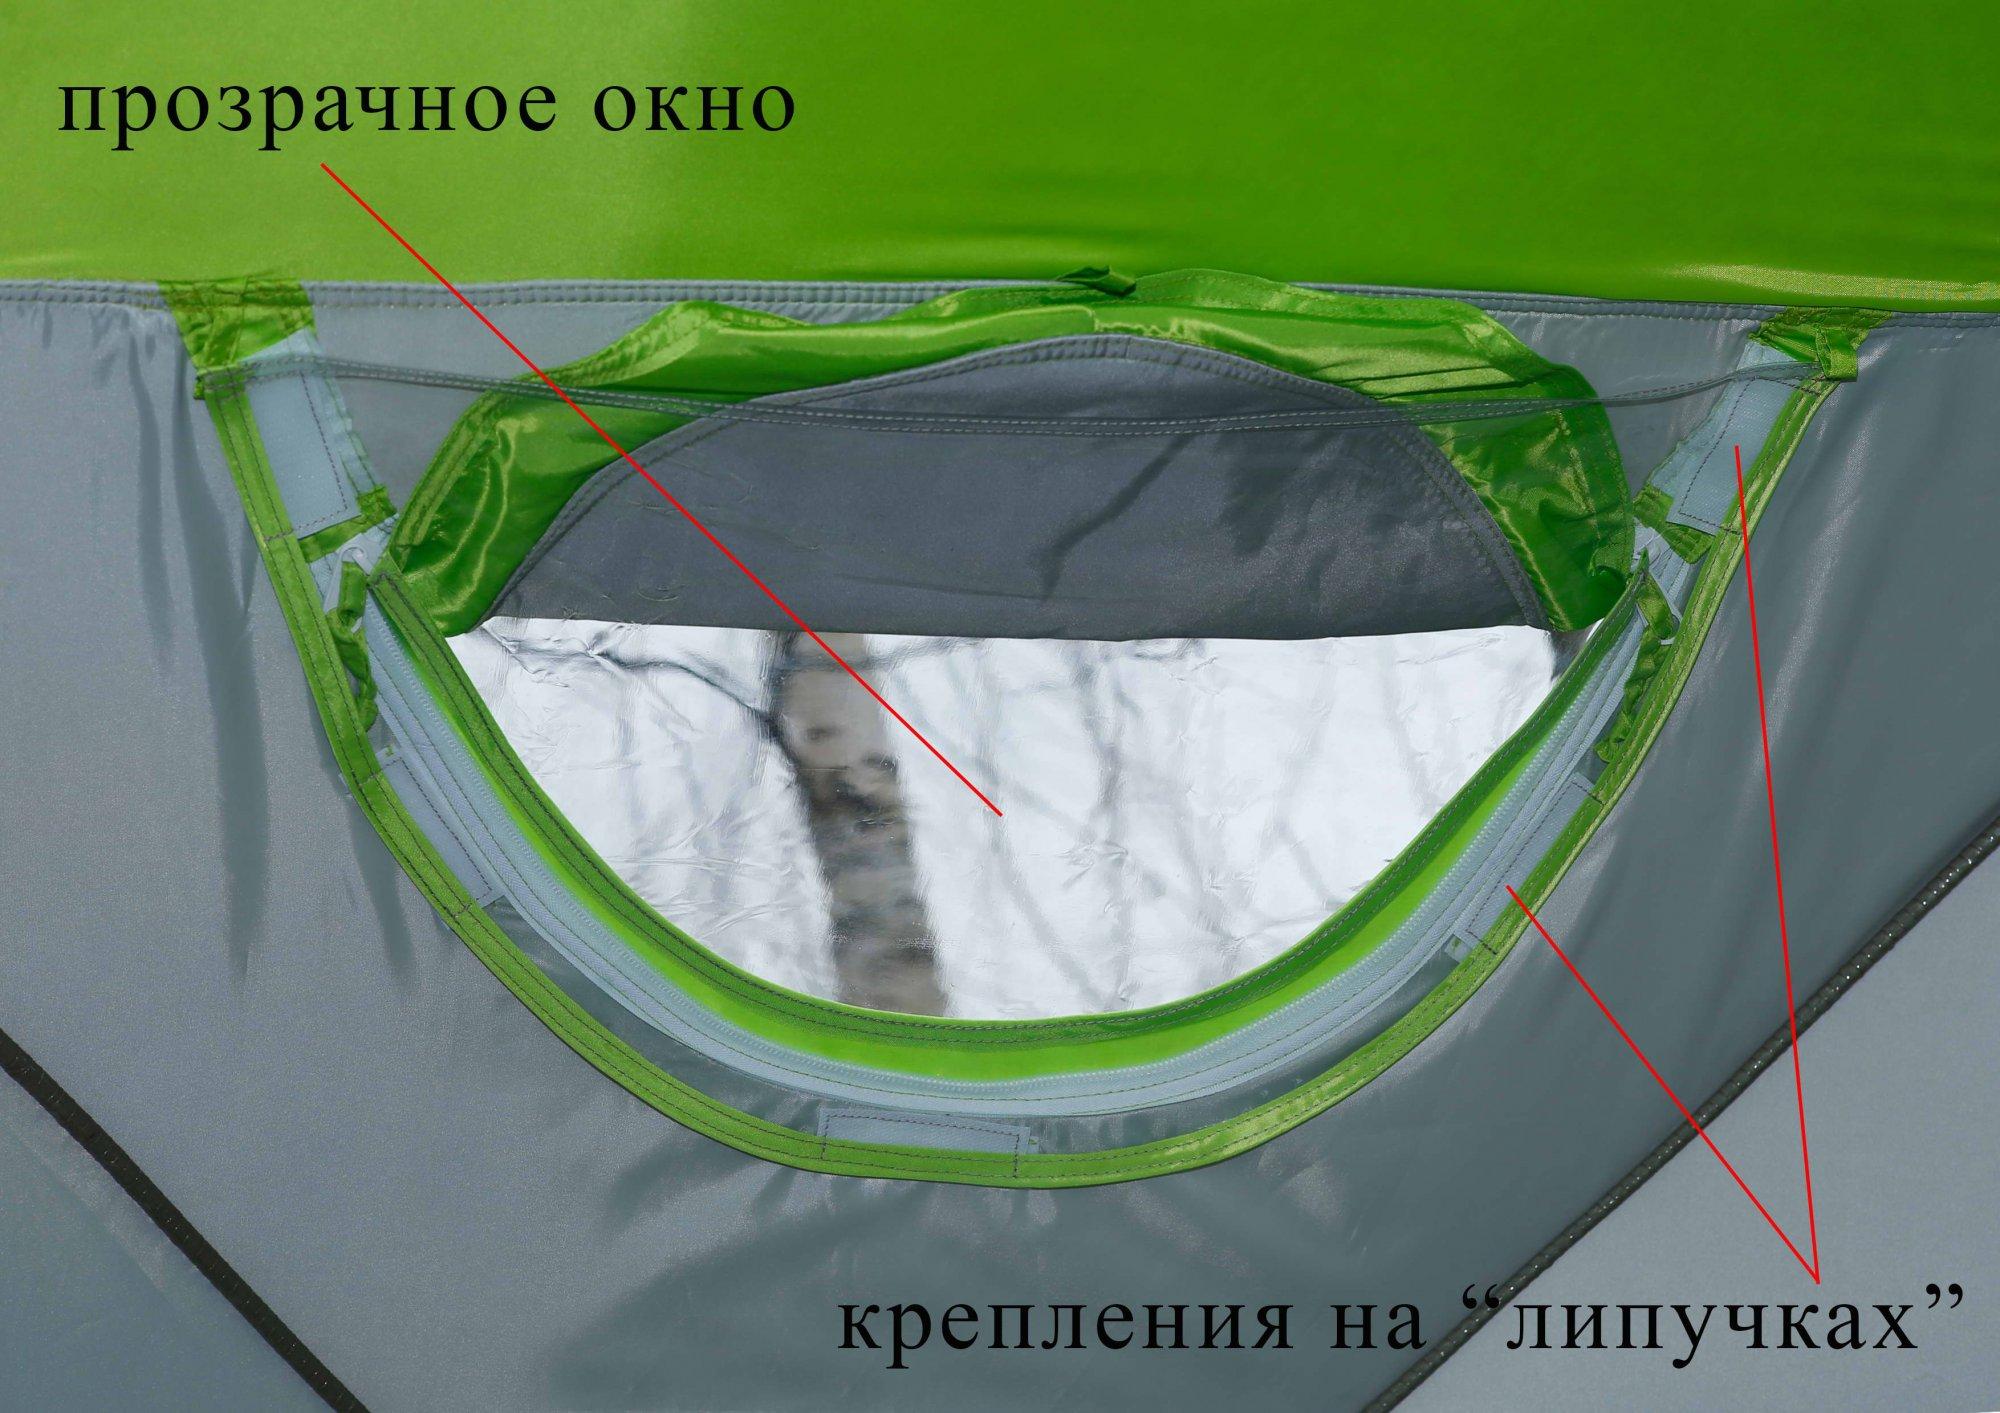 Зимняя палатка ЛОТОС Куб М2 Термо_съемное прозрачное окно, вид изнутри